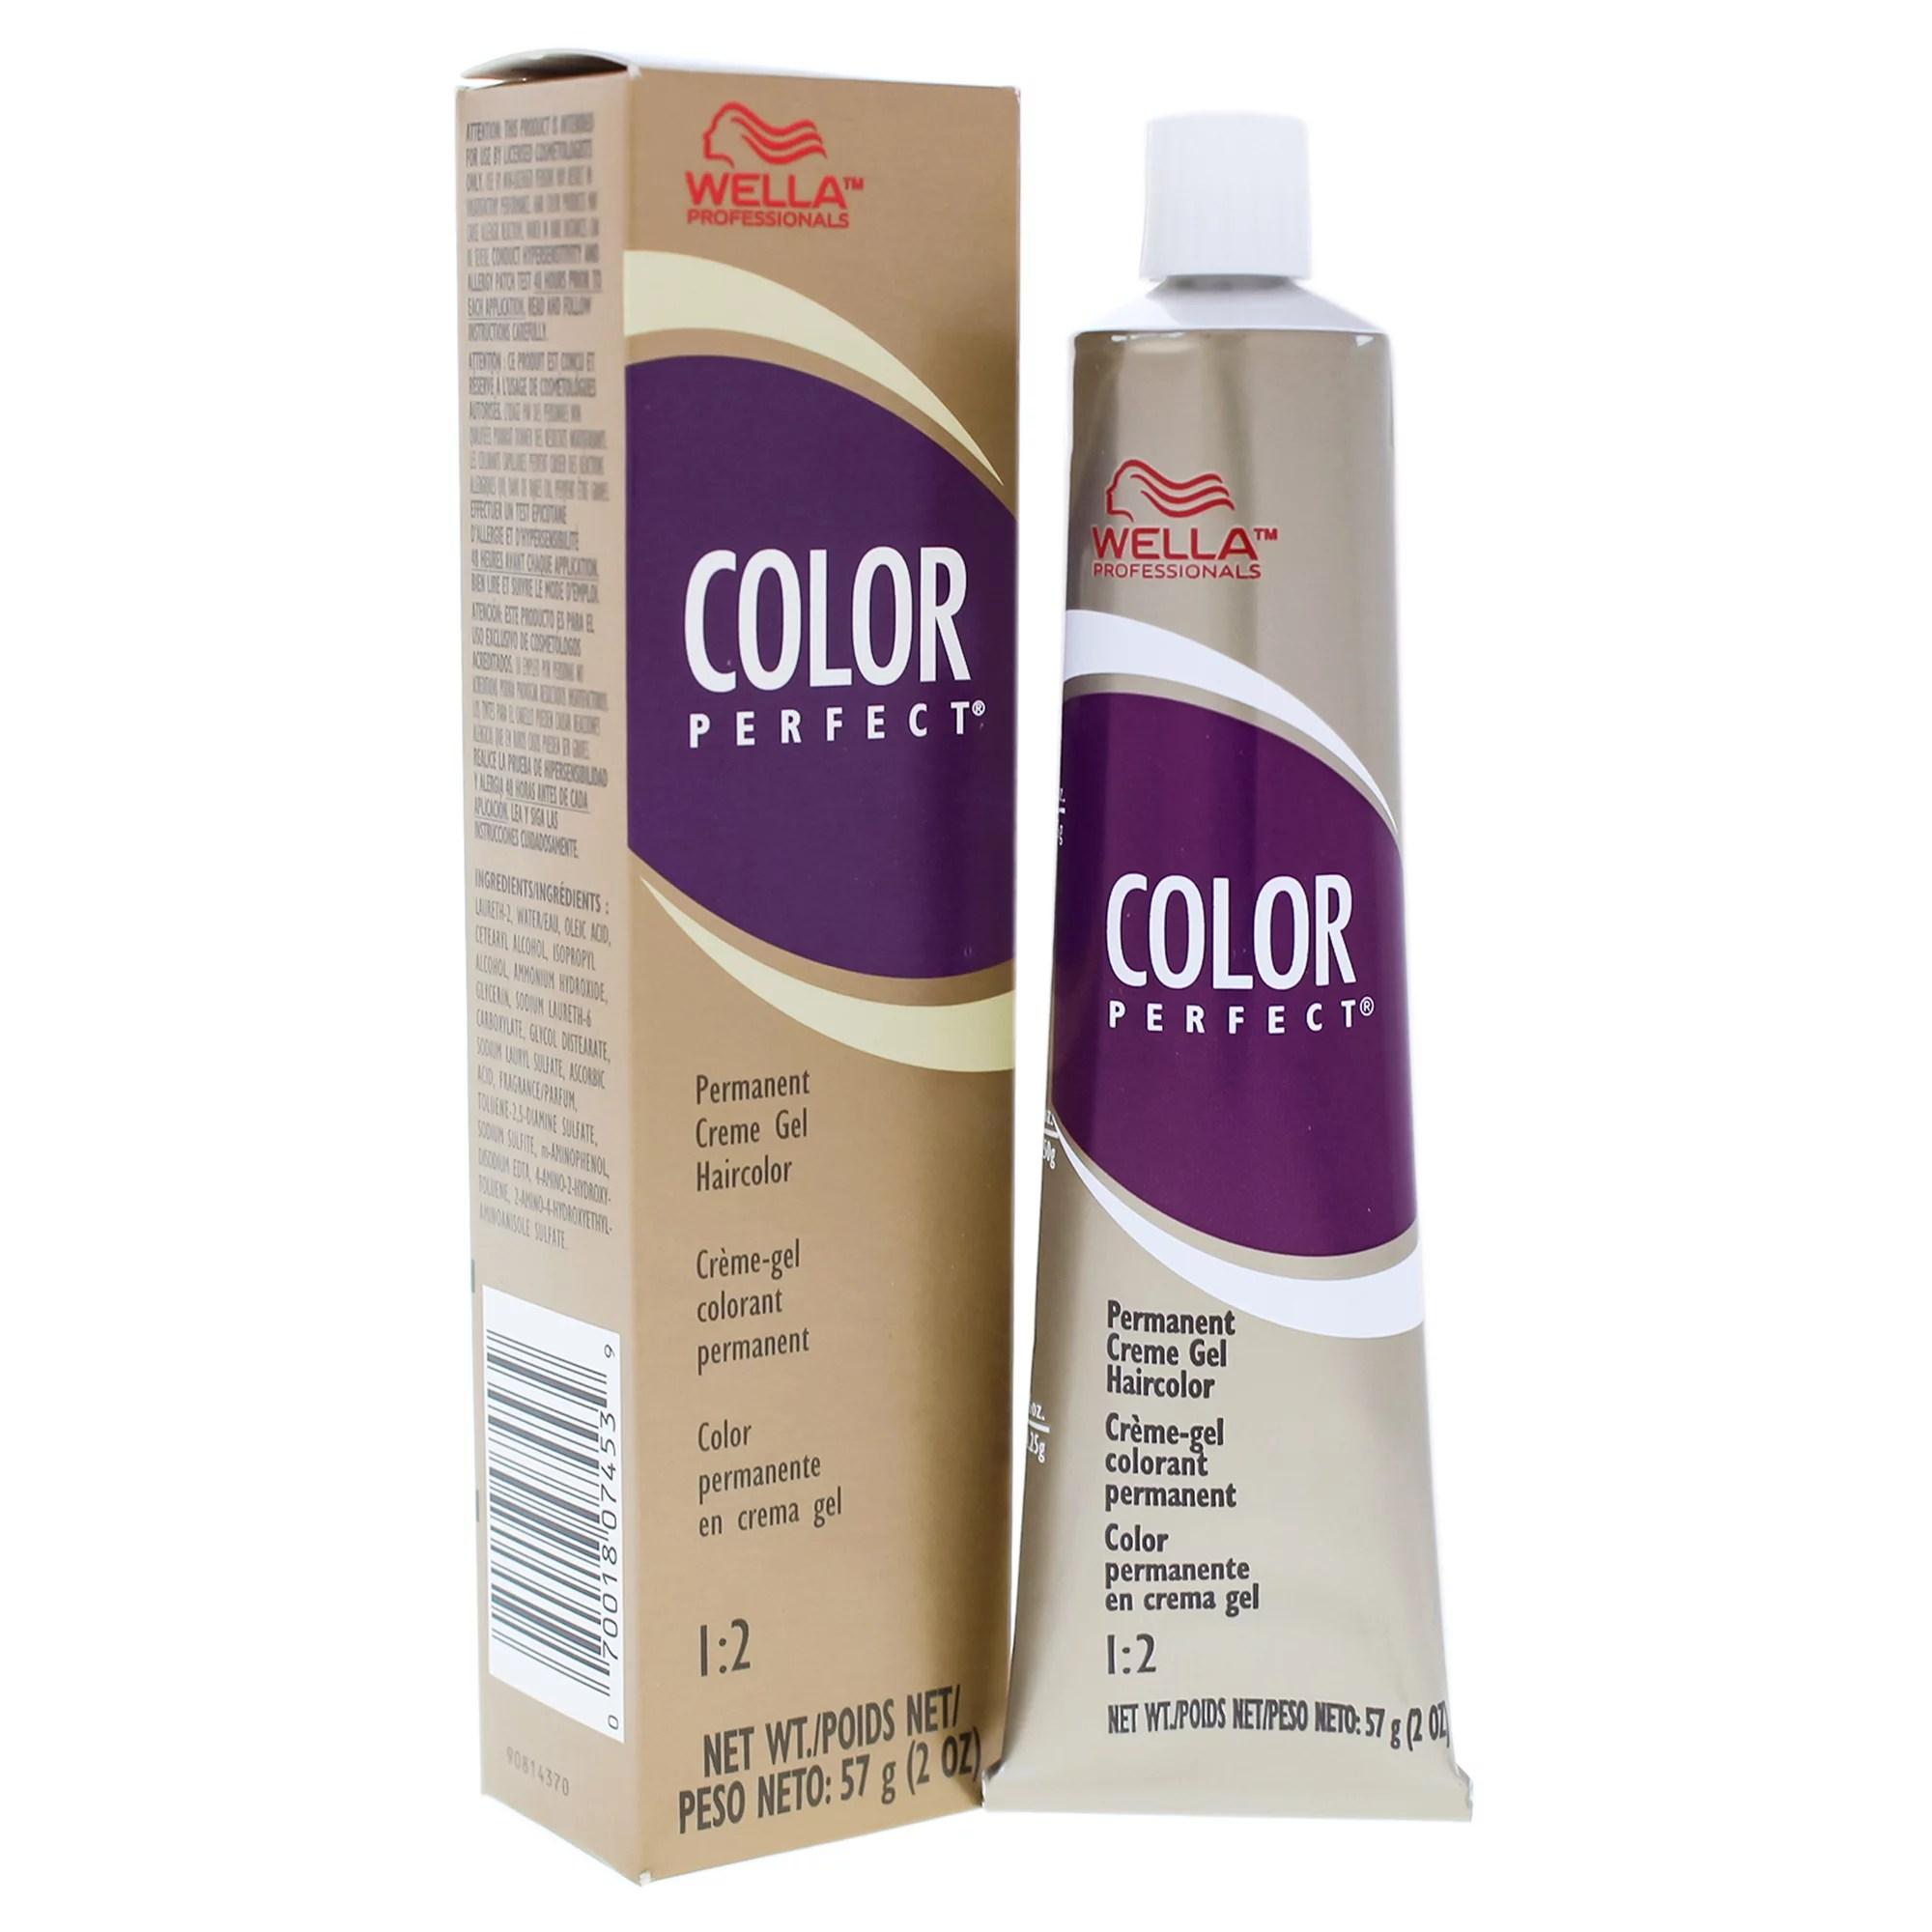 Color Perfect Permanent Cr?me Gel Hair Color – V Violet Modifier by Wella for Unisex – 2 oz Hair Color